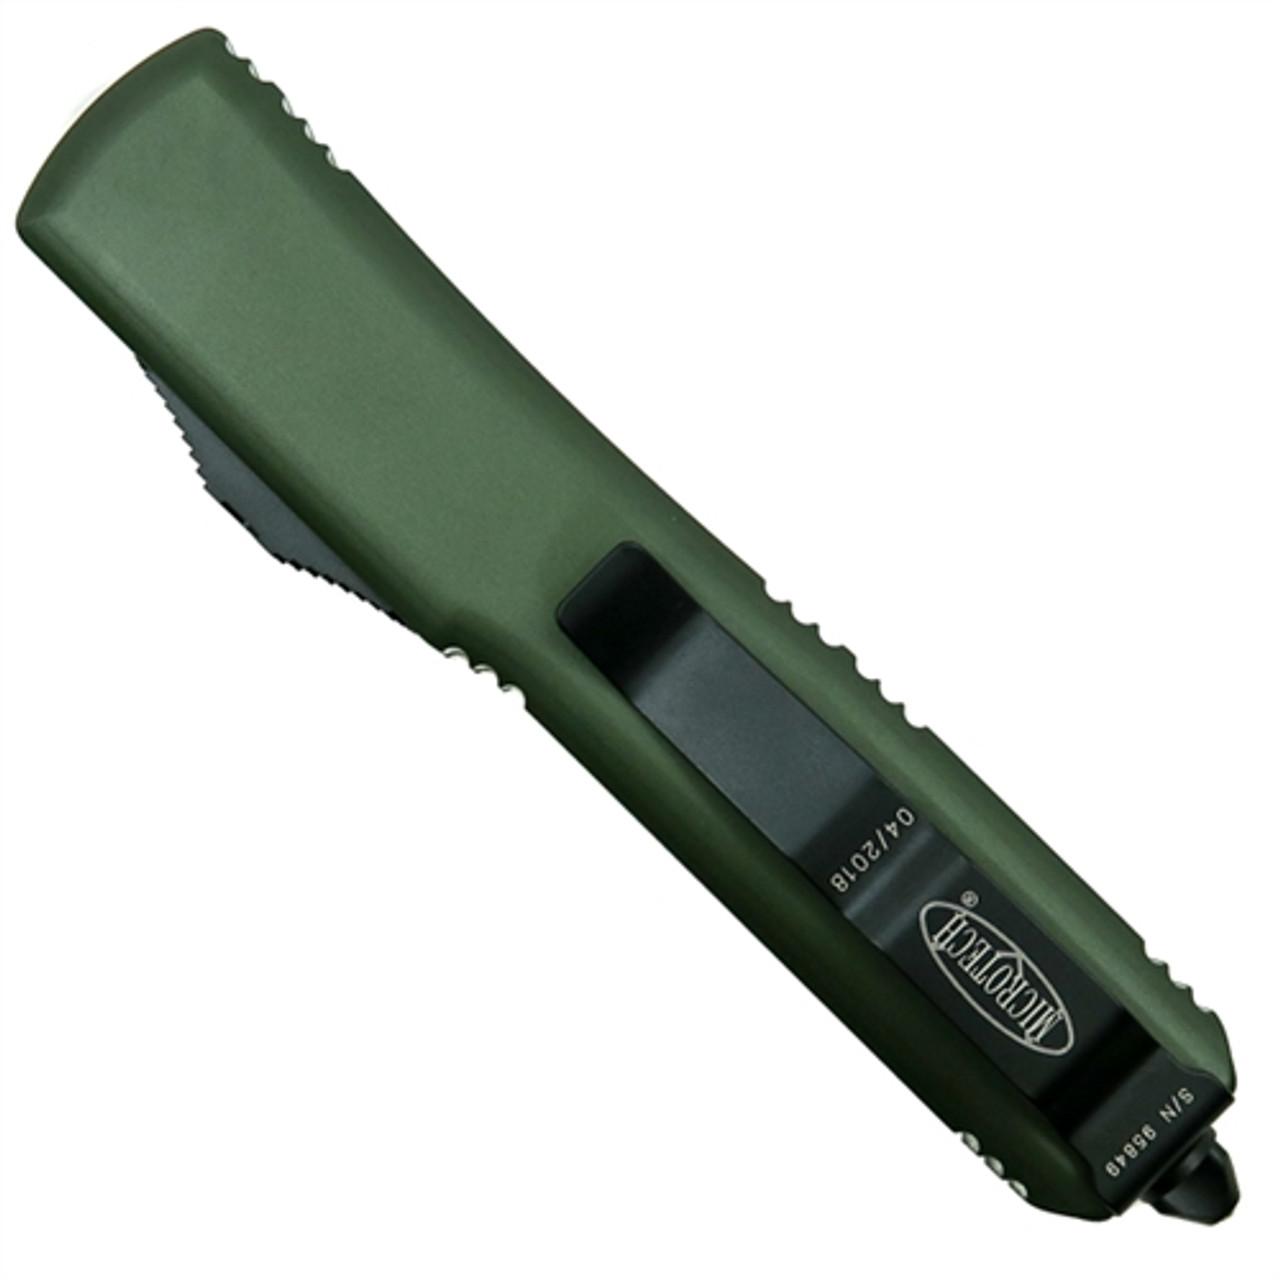 Microtech 122-1OD OD Green Contoured Ultratech D/E OTF Auto Knife, Black Blade